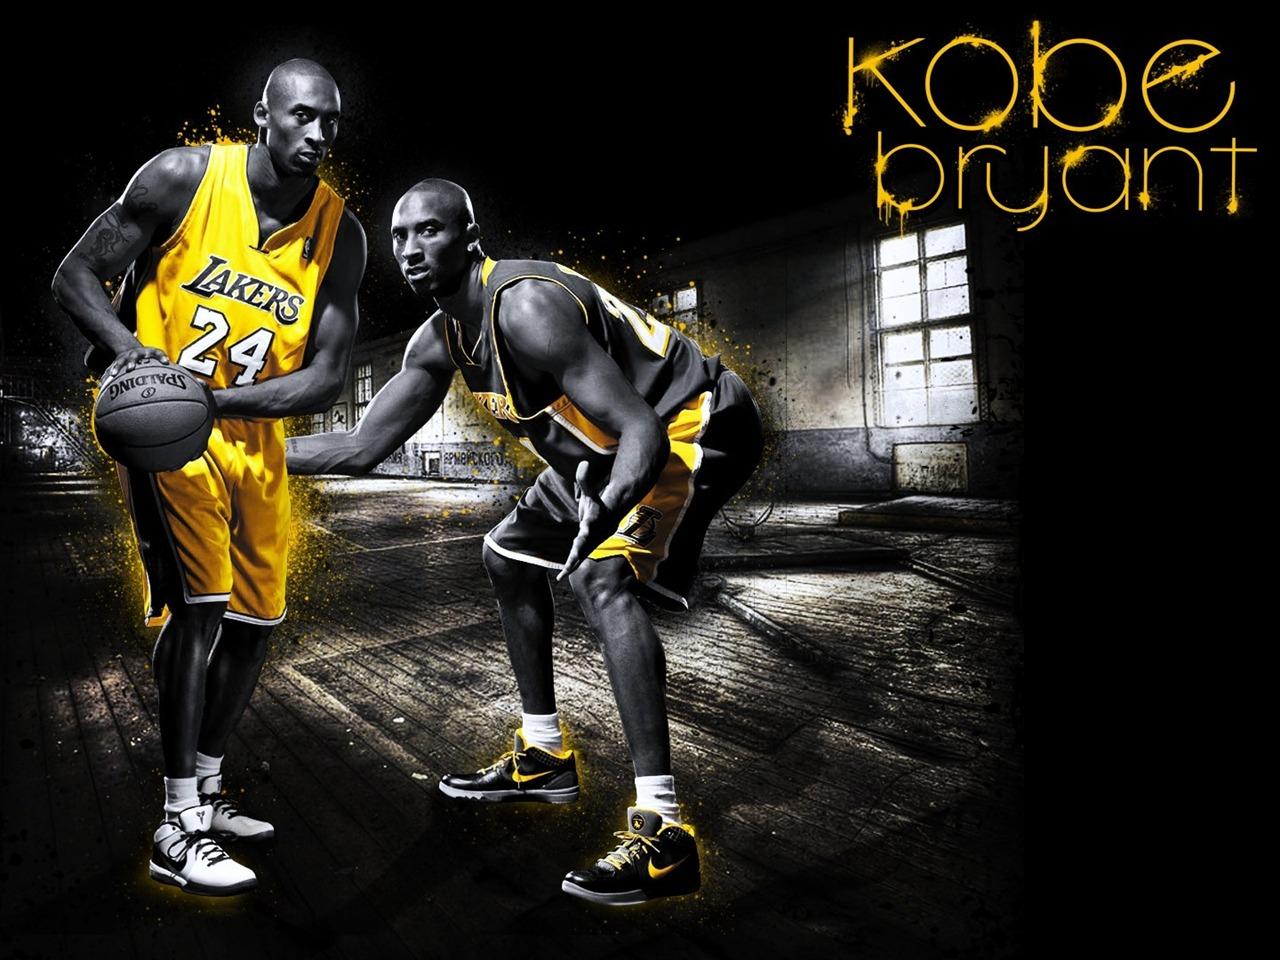 Los wallpaper Angeles Kobe Bryant-NBA  02 Preview Lakers